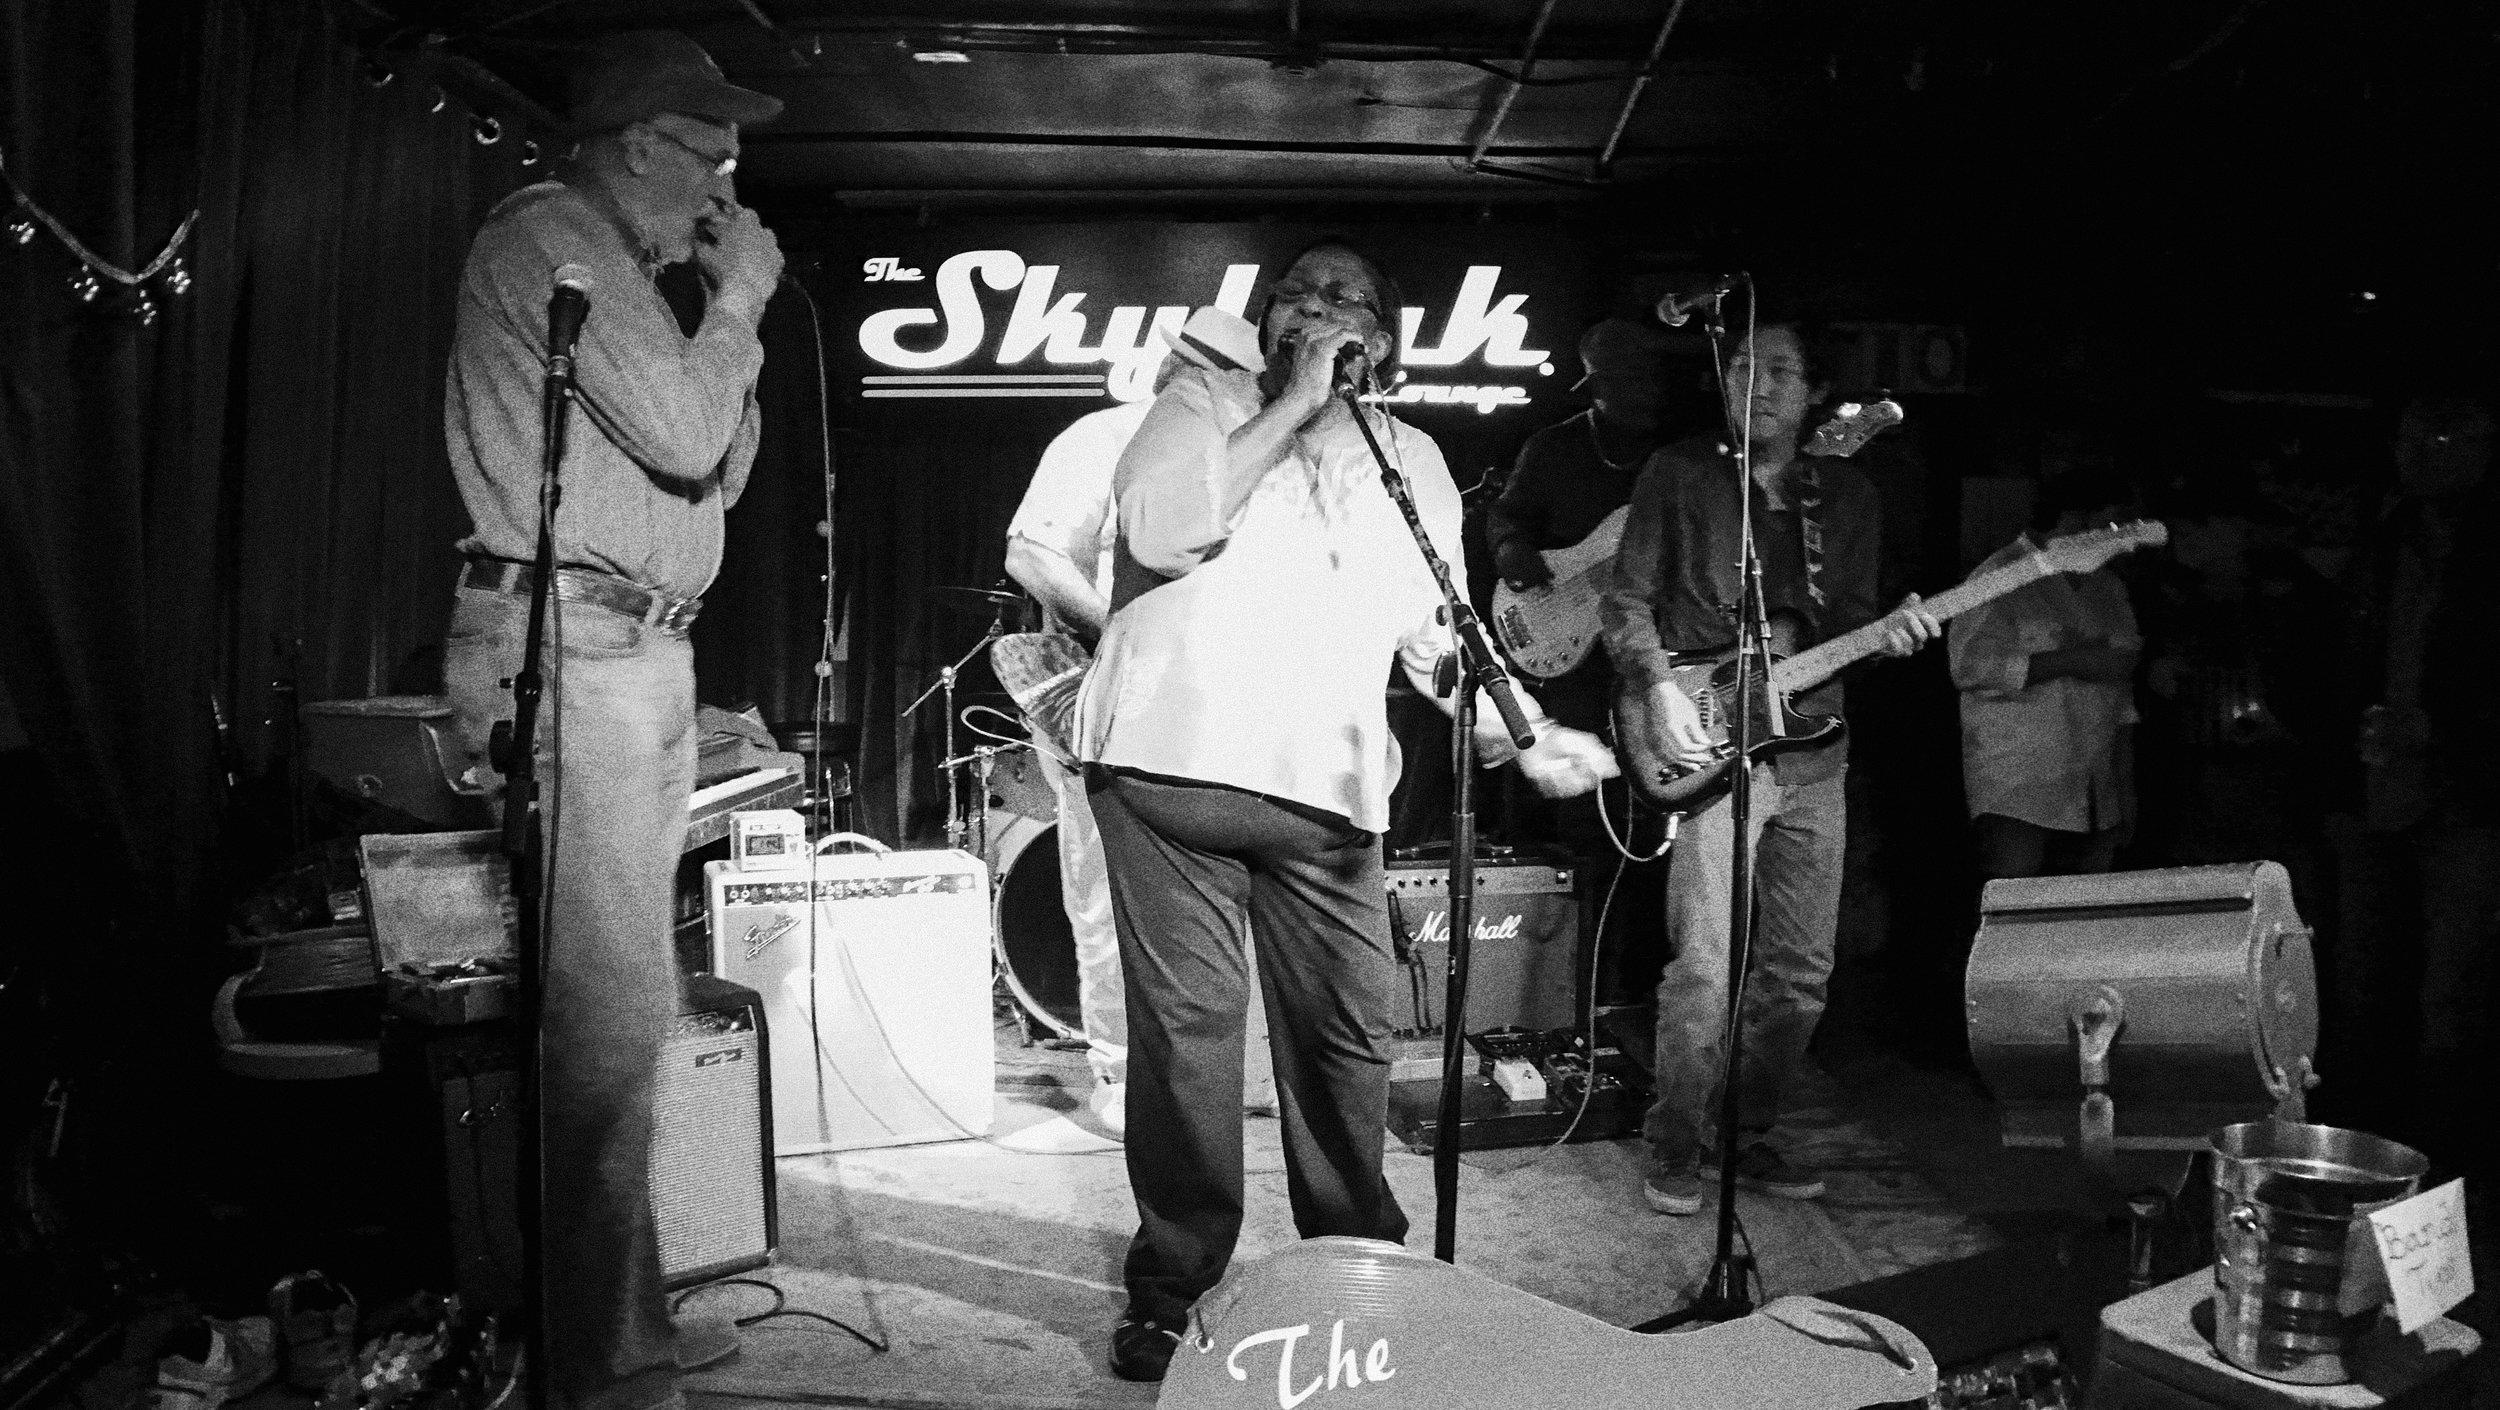 skylark-austin-blues-jam-1406.jpg